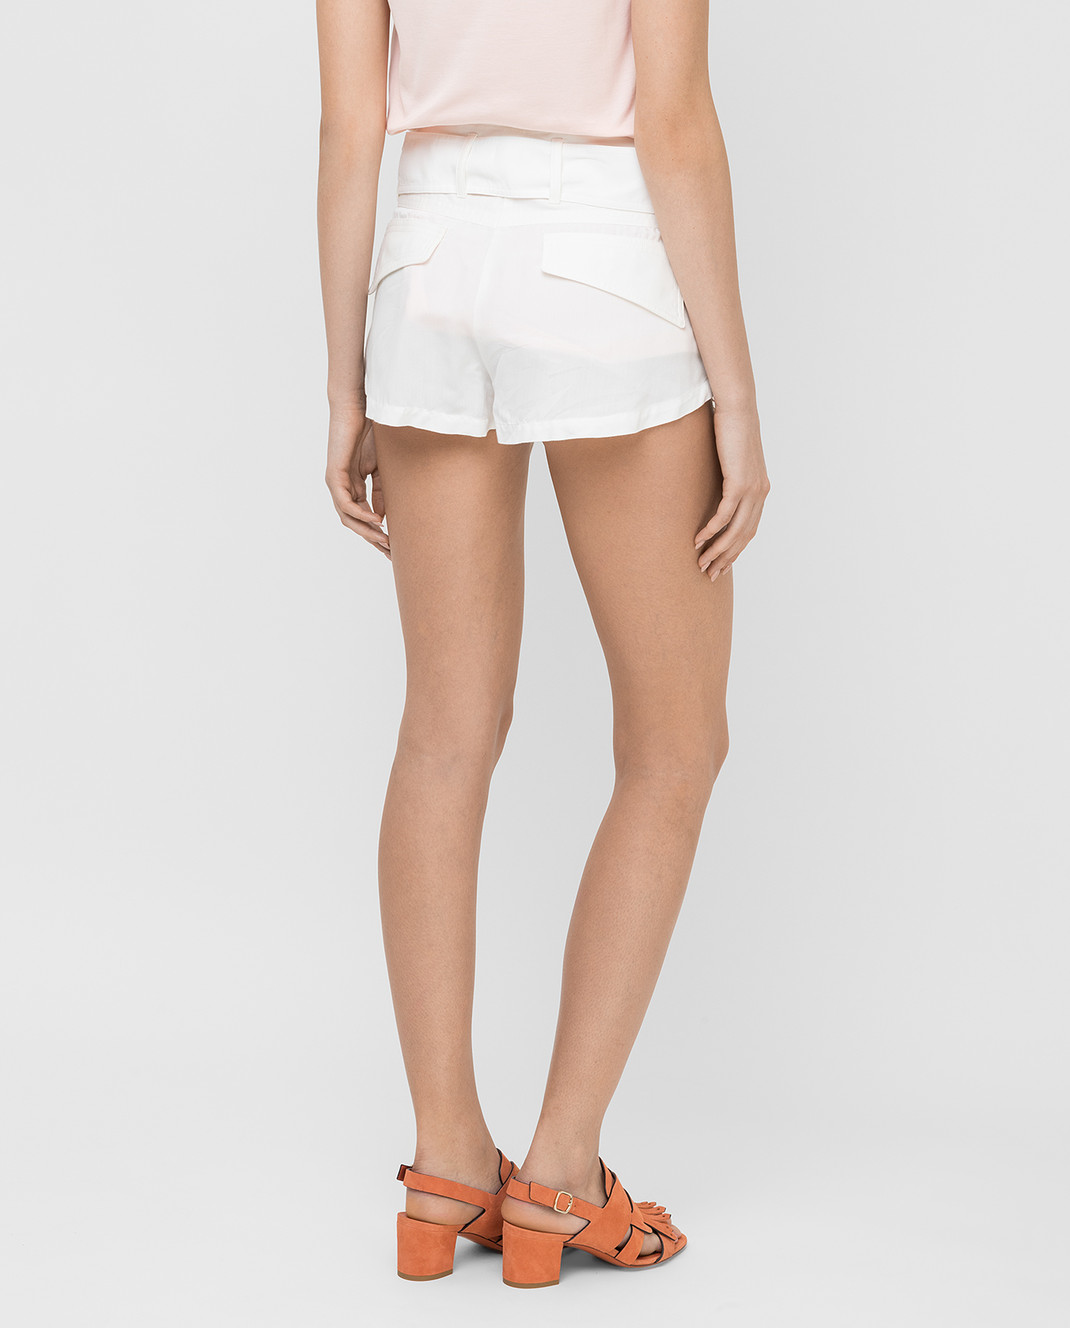 Roberto Cavalli Белые шорты CQR232 изображение 4